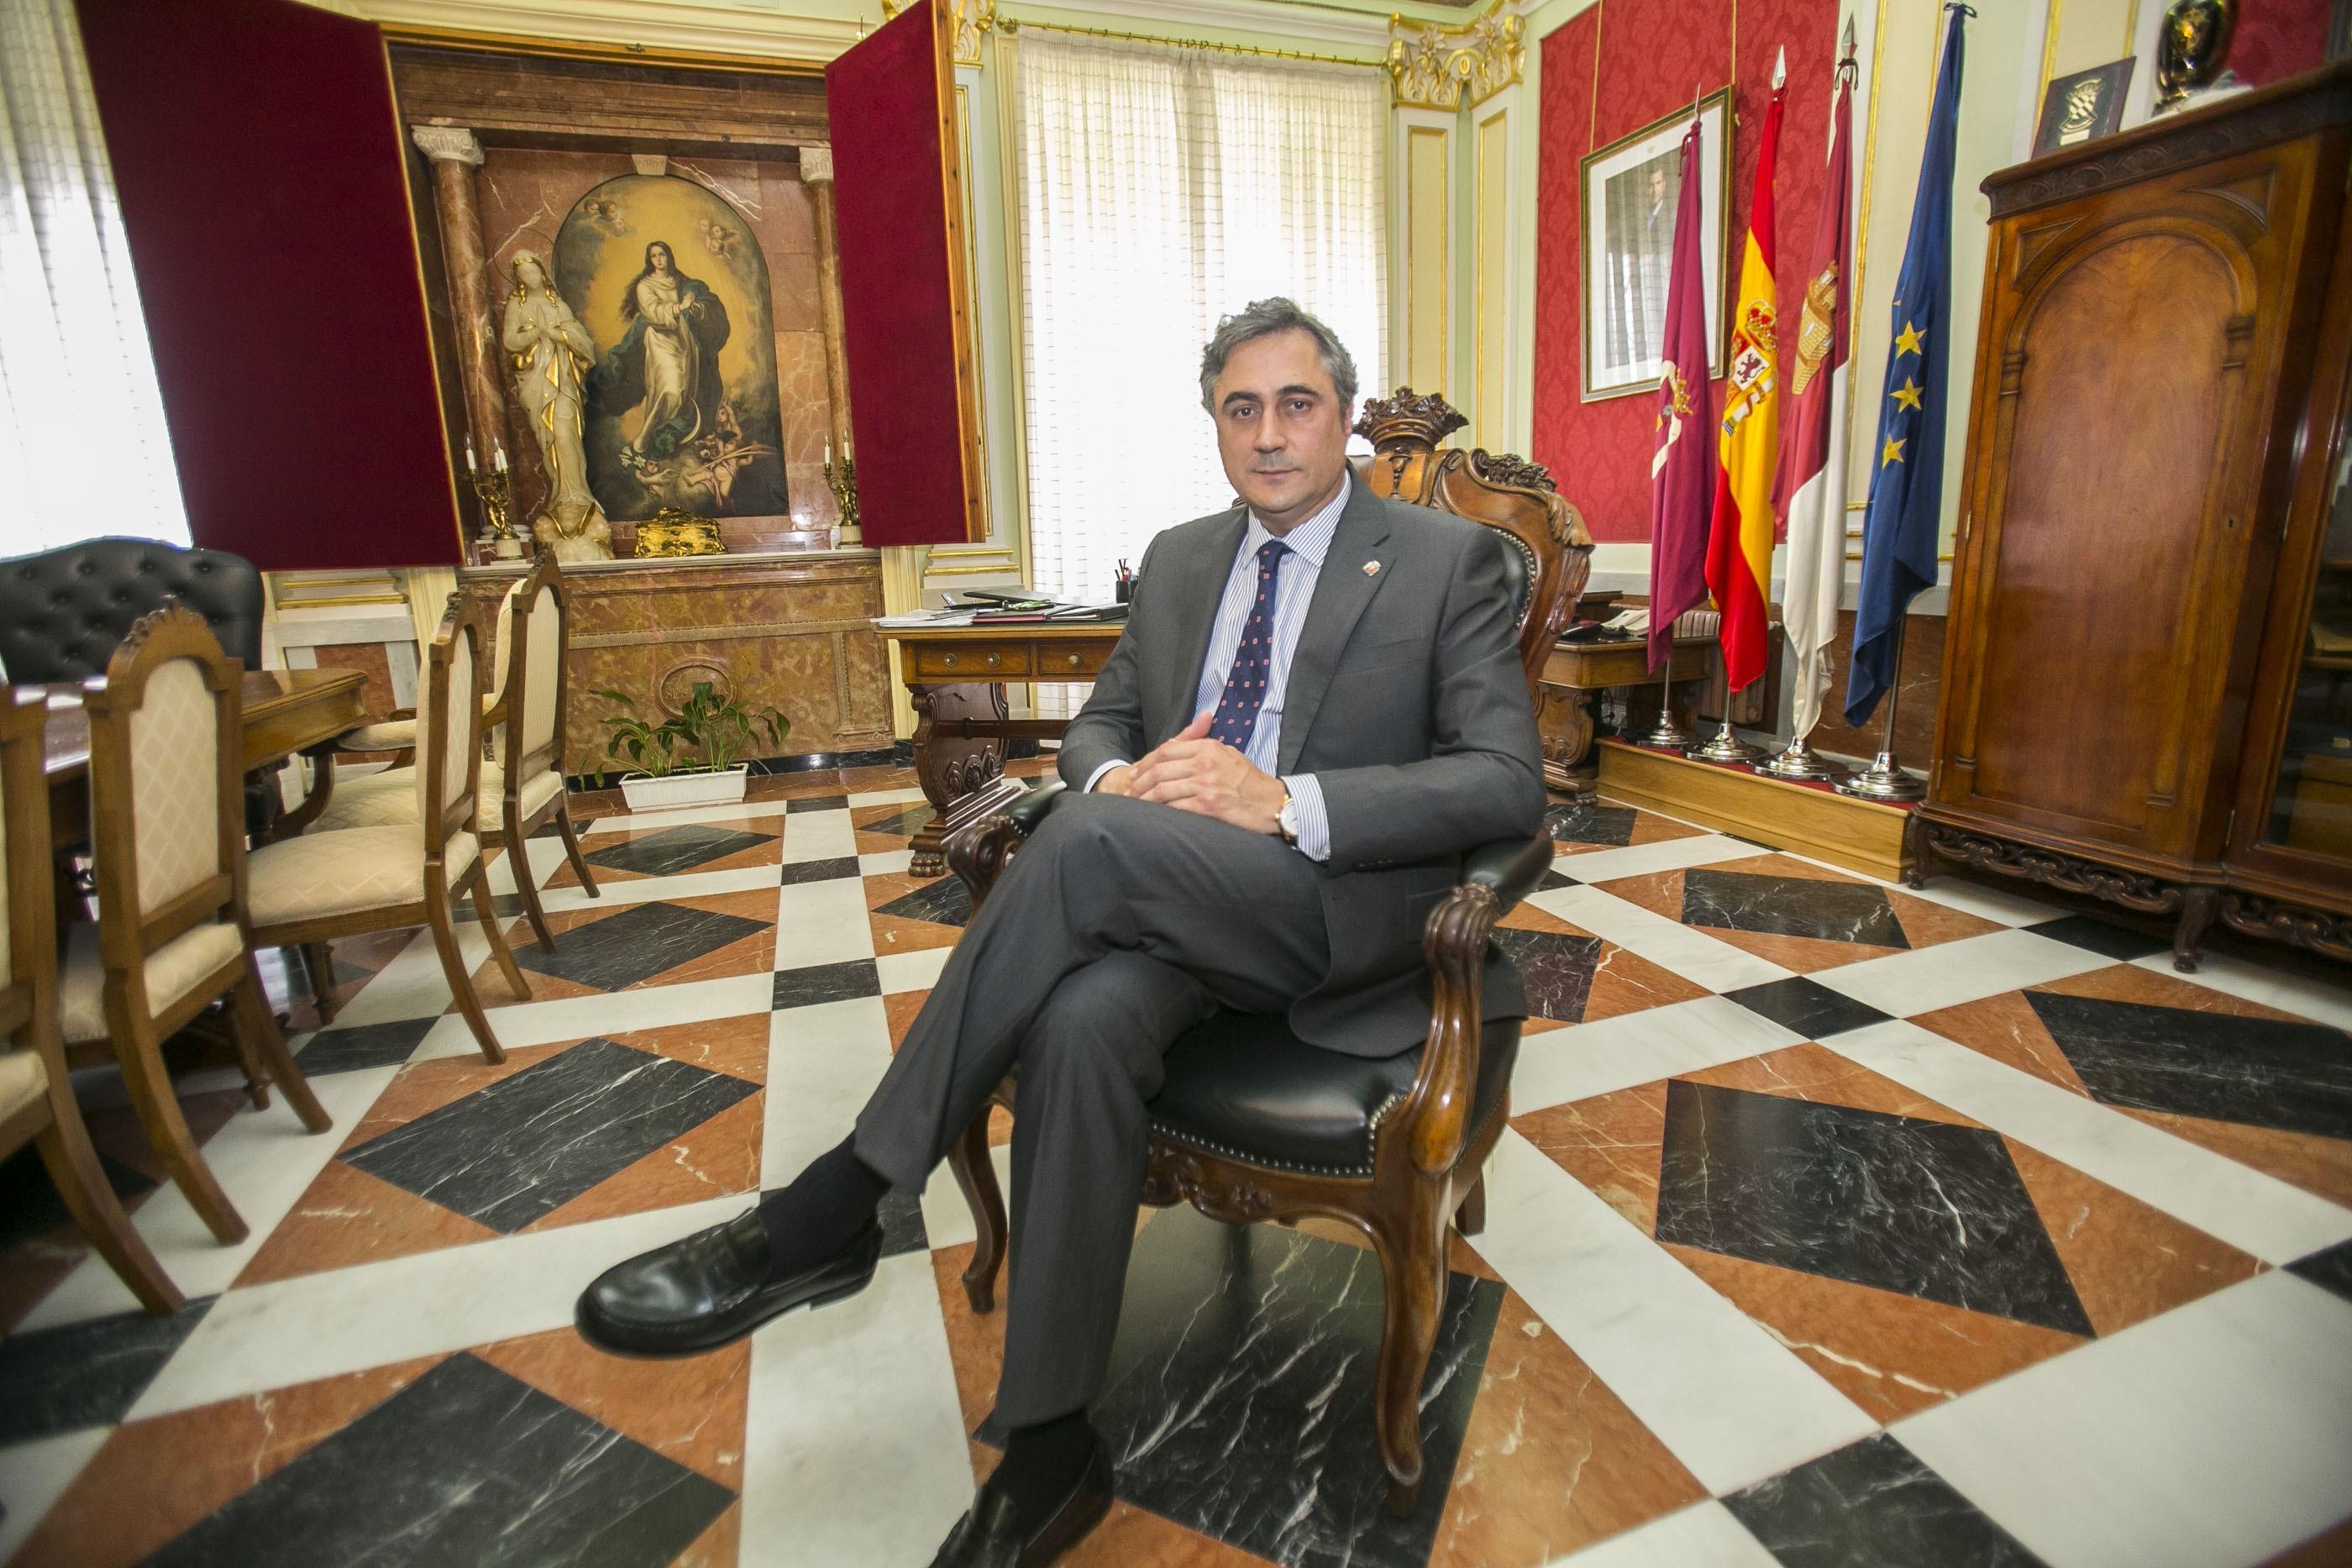 Alcalde de Cuenca. Angel Mariscal Estrada